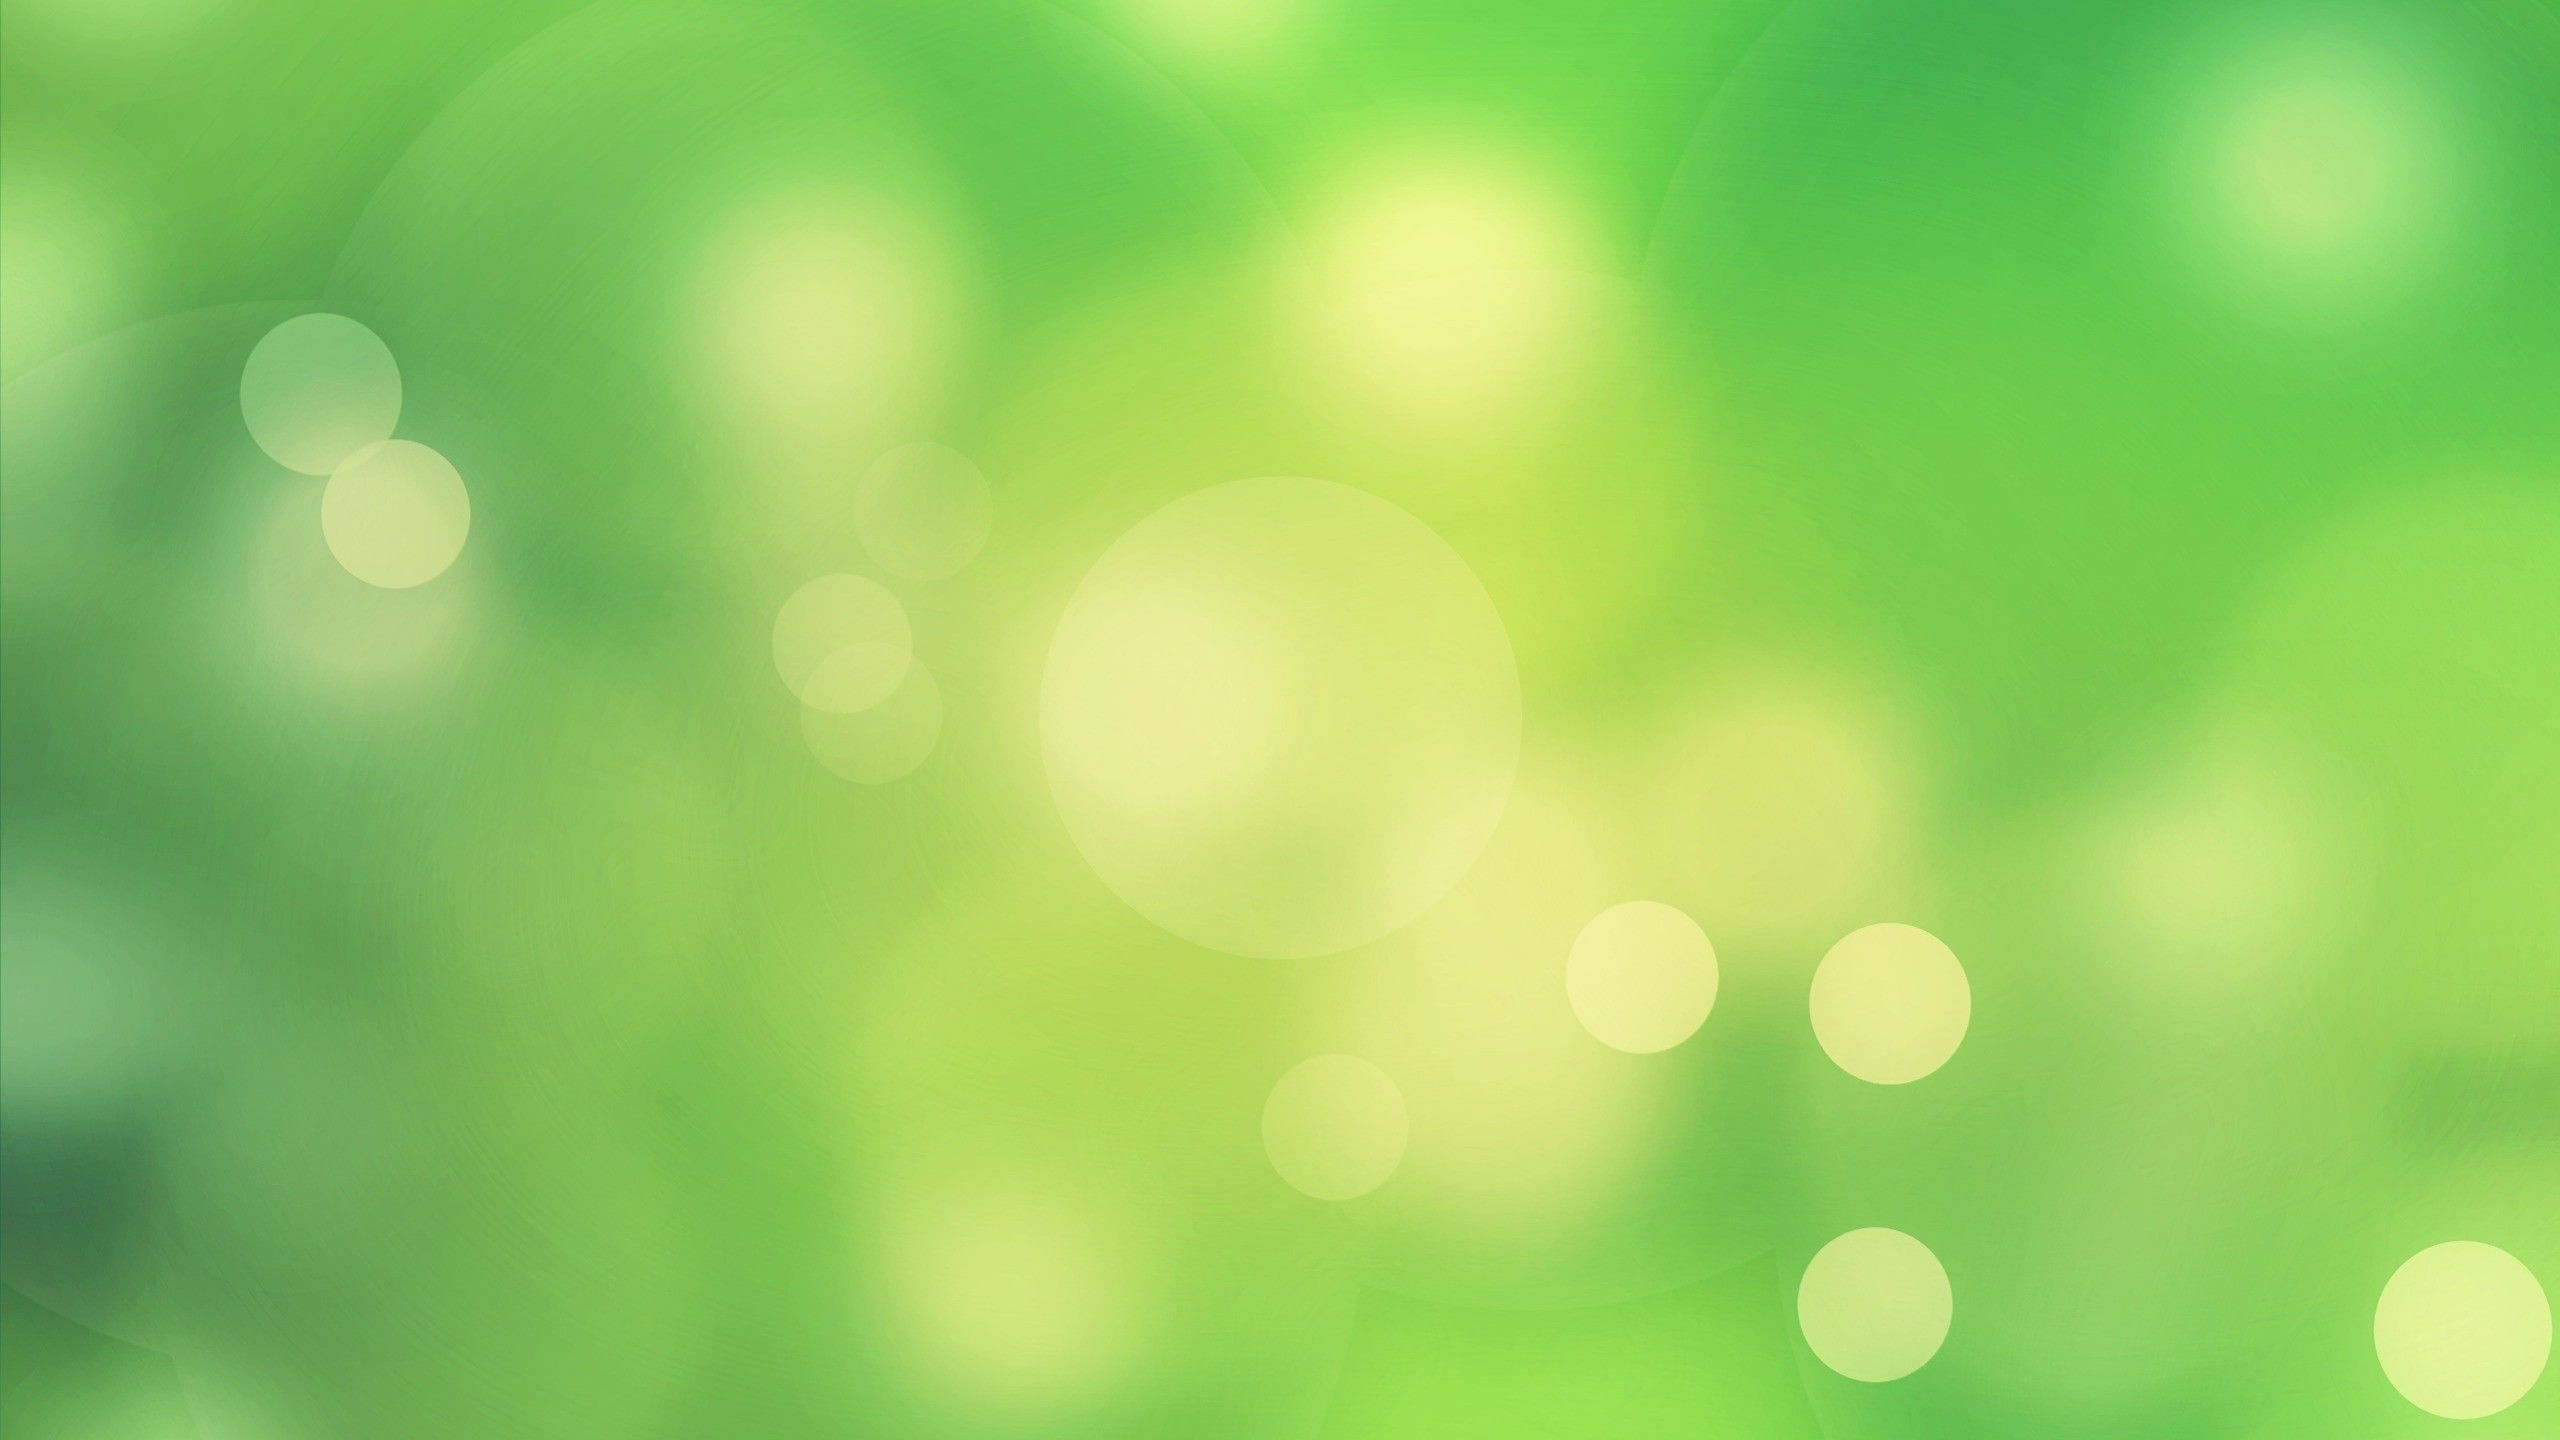 Wallpaper Green Screen Background Hd